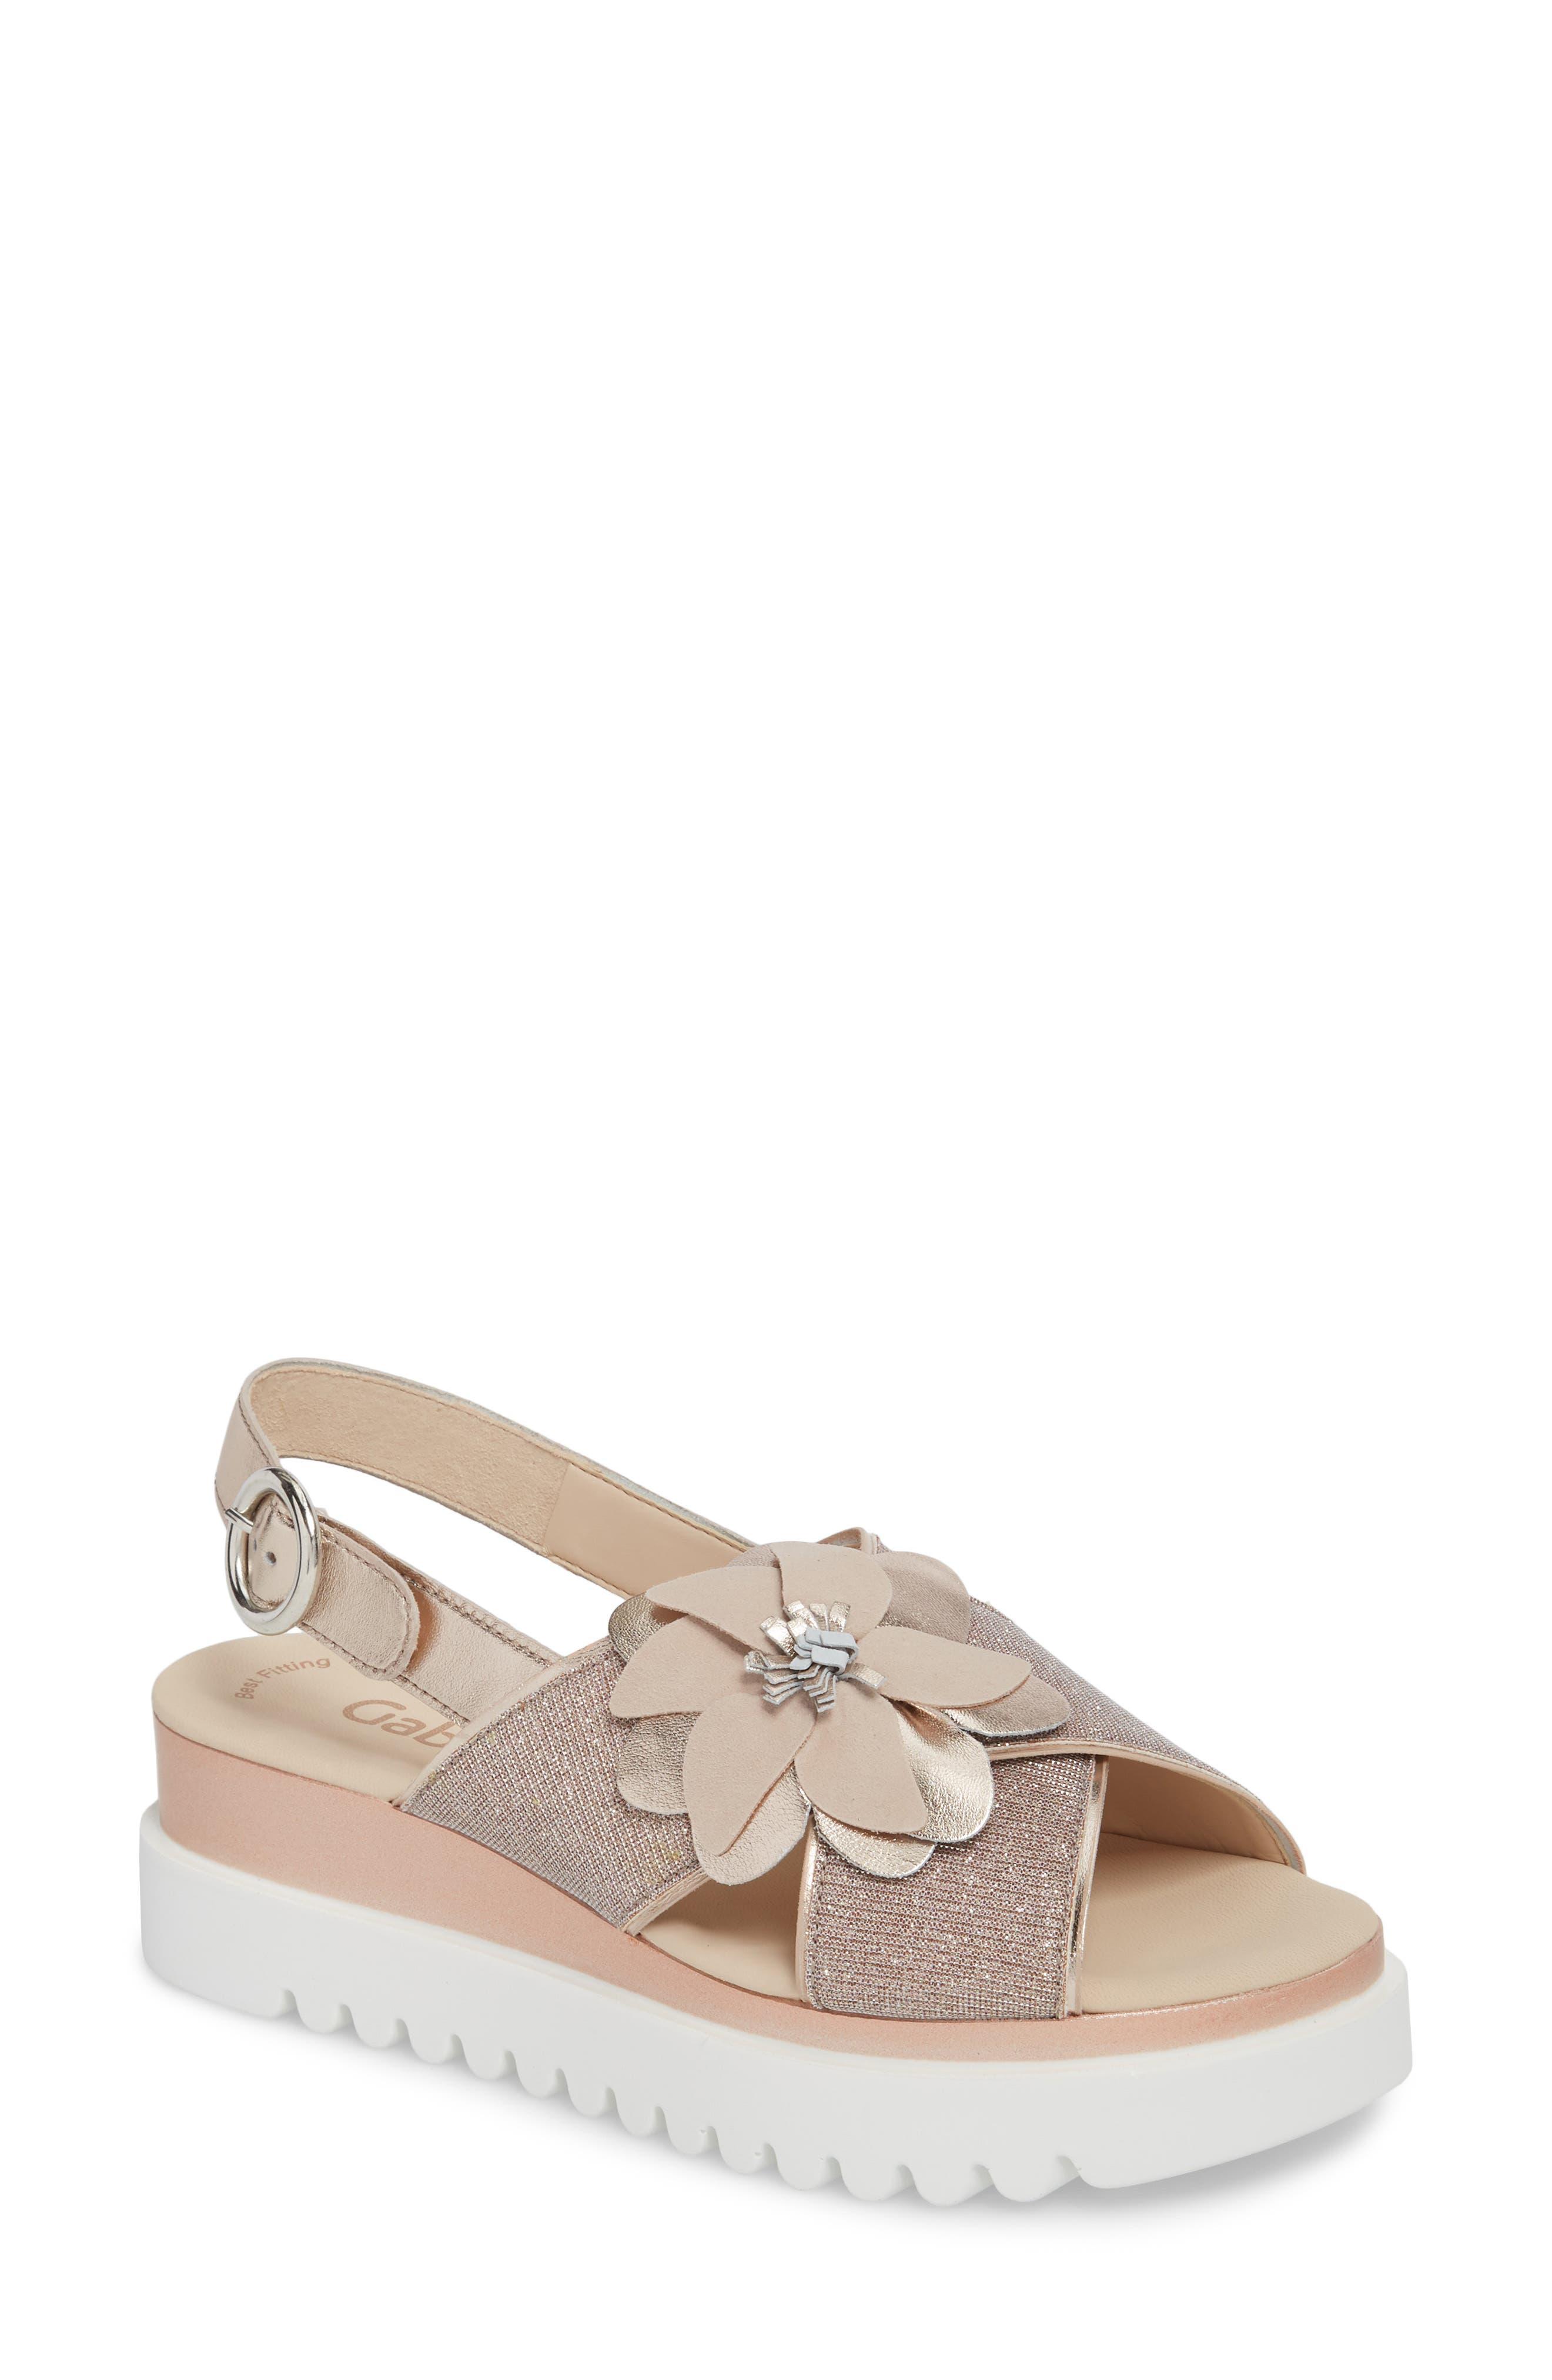 Flower Platform Sandal,                             Main thumbnail 1, color,                             710